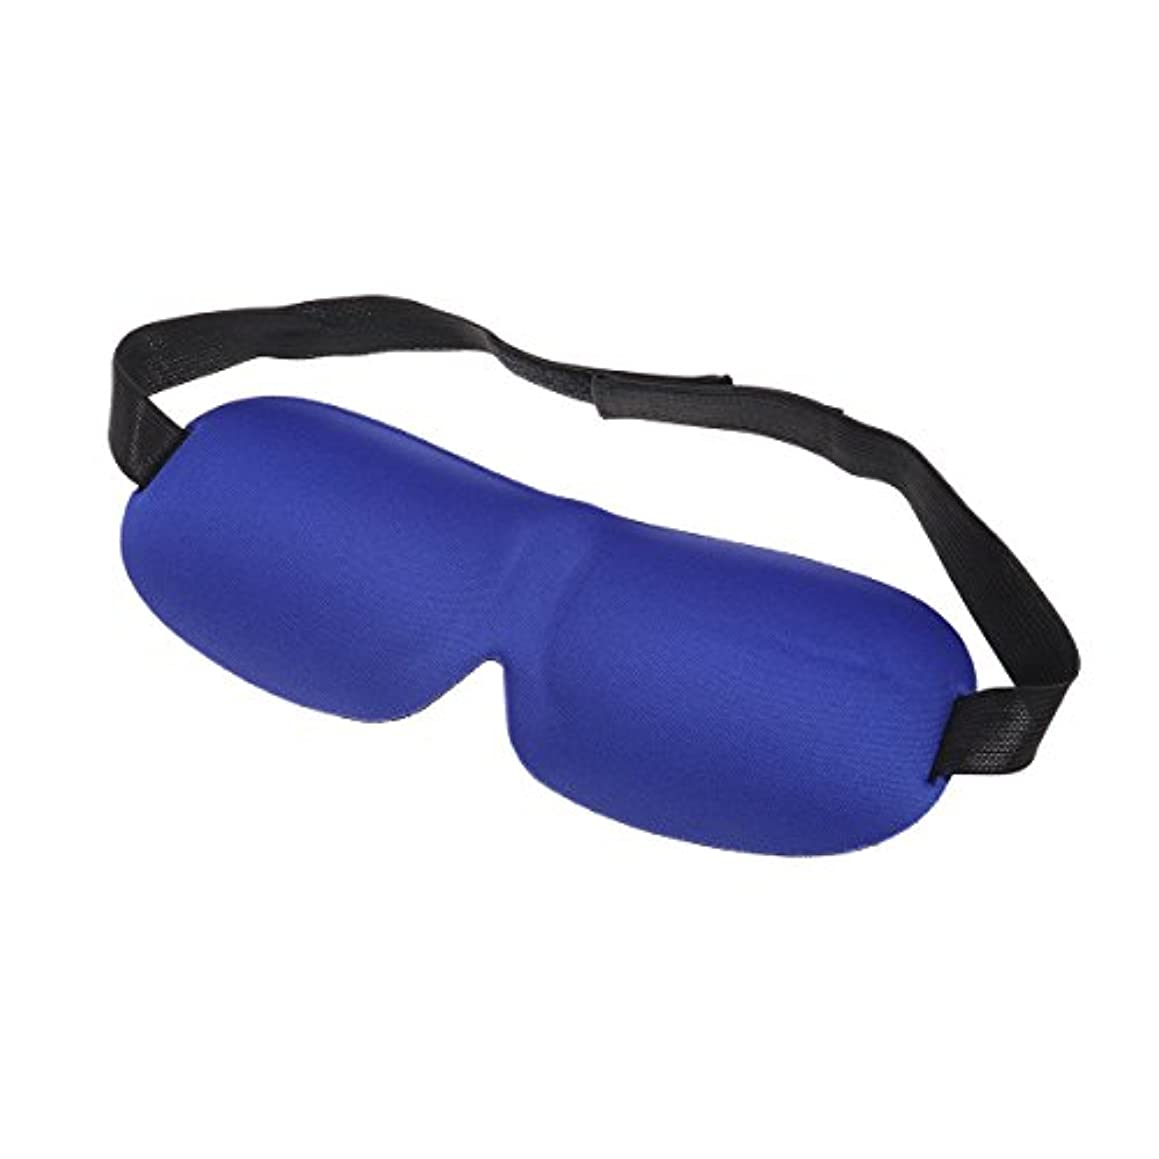 ROSENICE アイマスク 遮光 睡眠 軽量 目隠し 圧迫感なし 調節可能 3D睡眠マスク(ブルー)